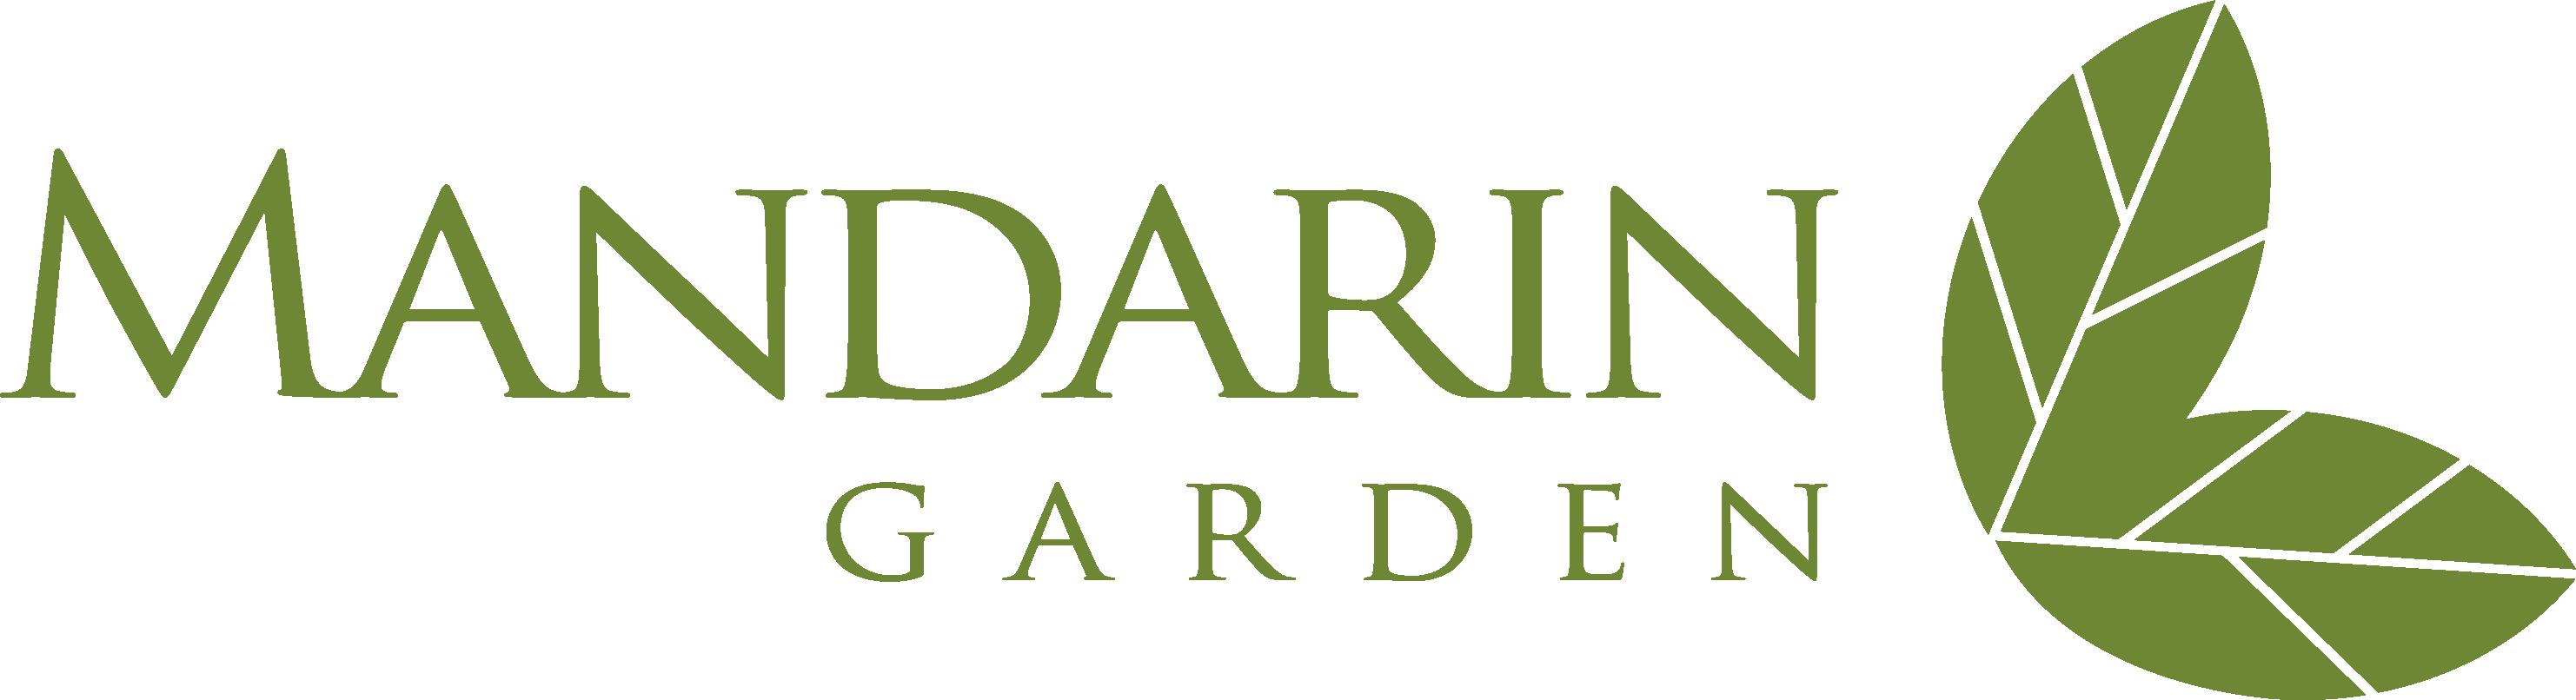 Mandarin Garden 2